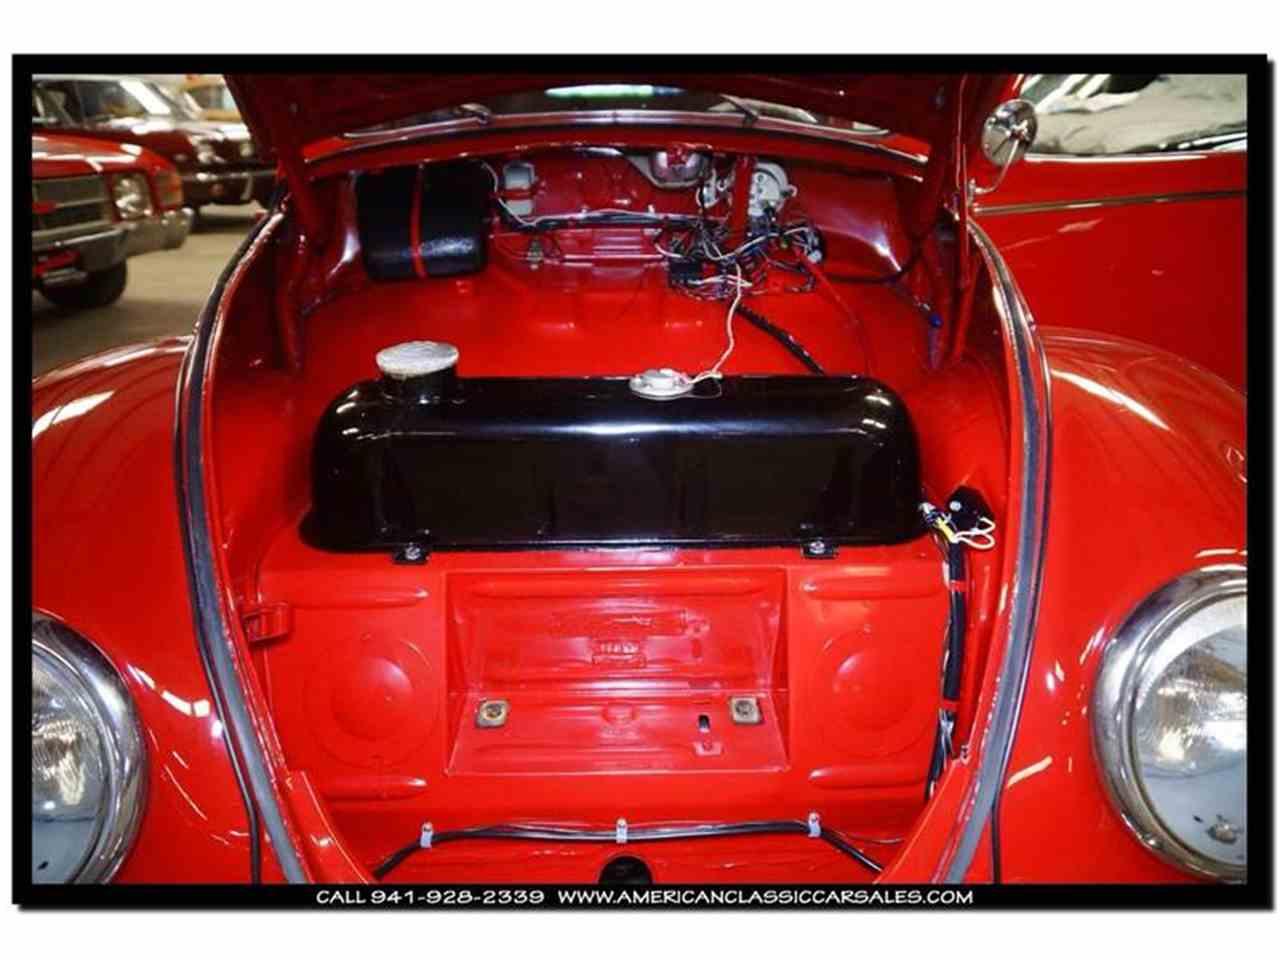 1955 Volkswagen Beetle For Sale Classiccars Com Cc 867920